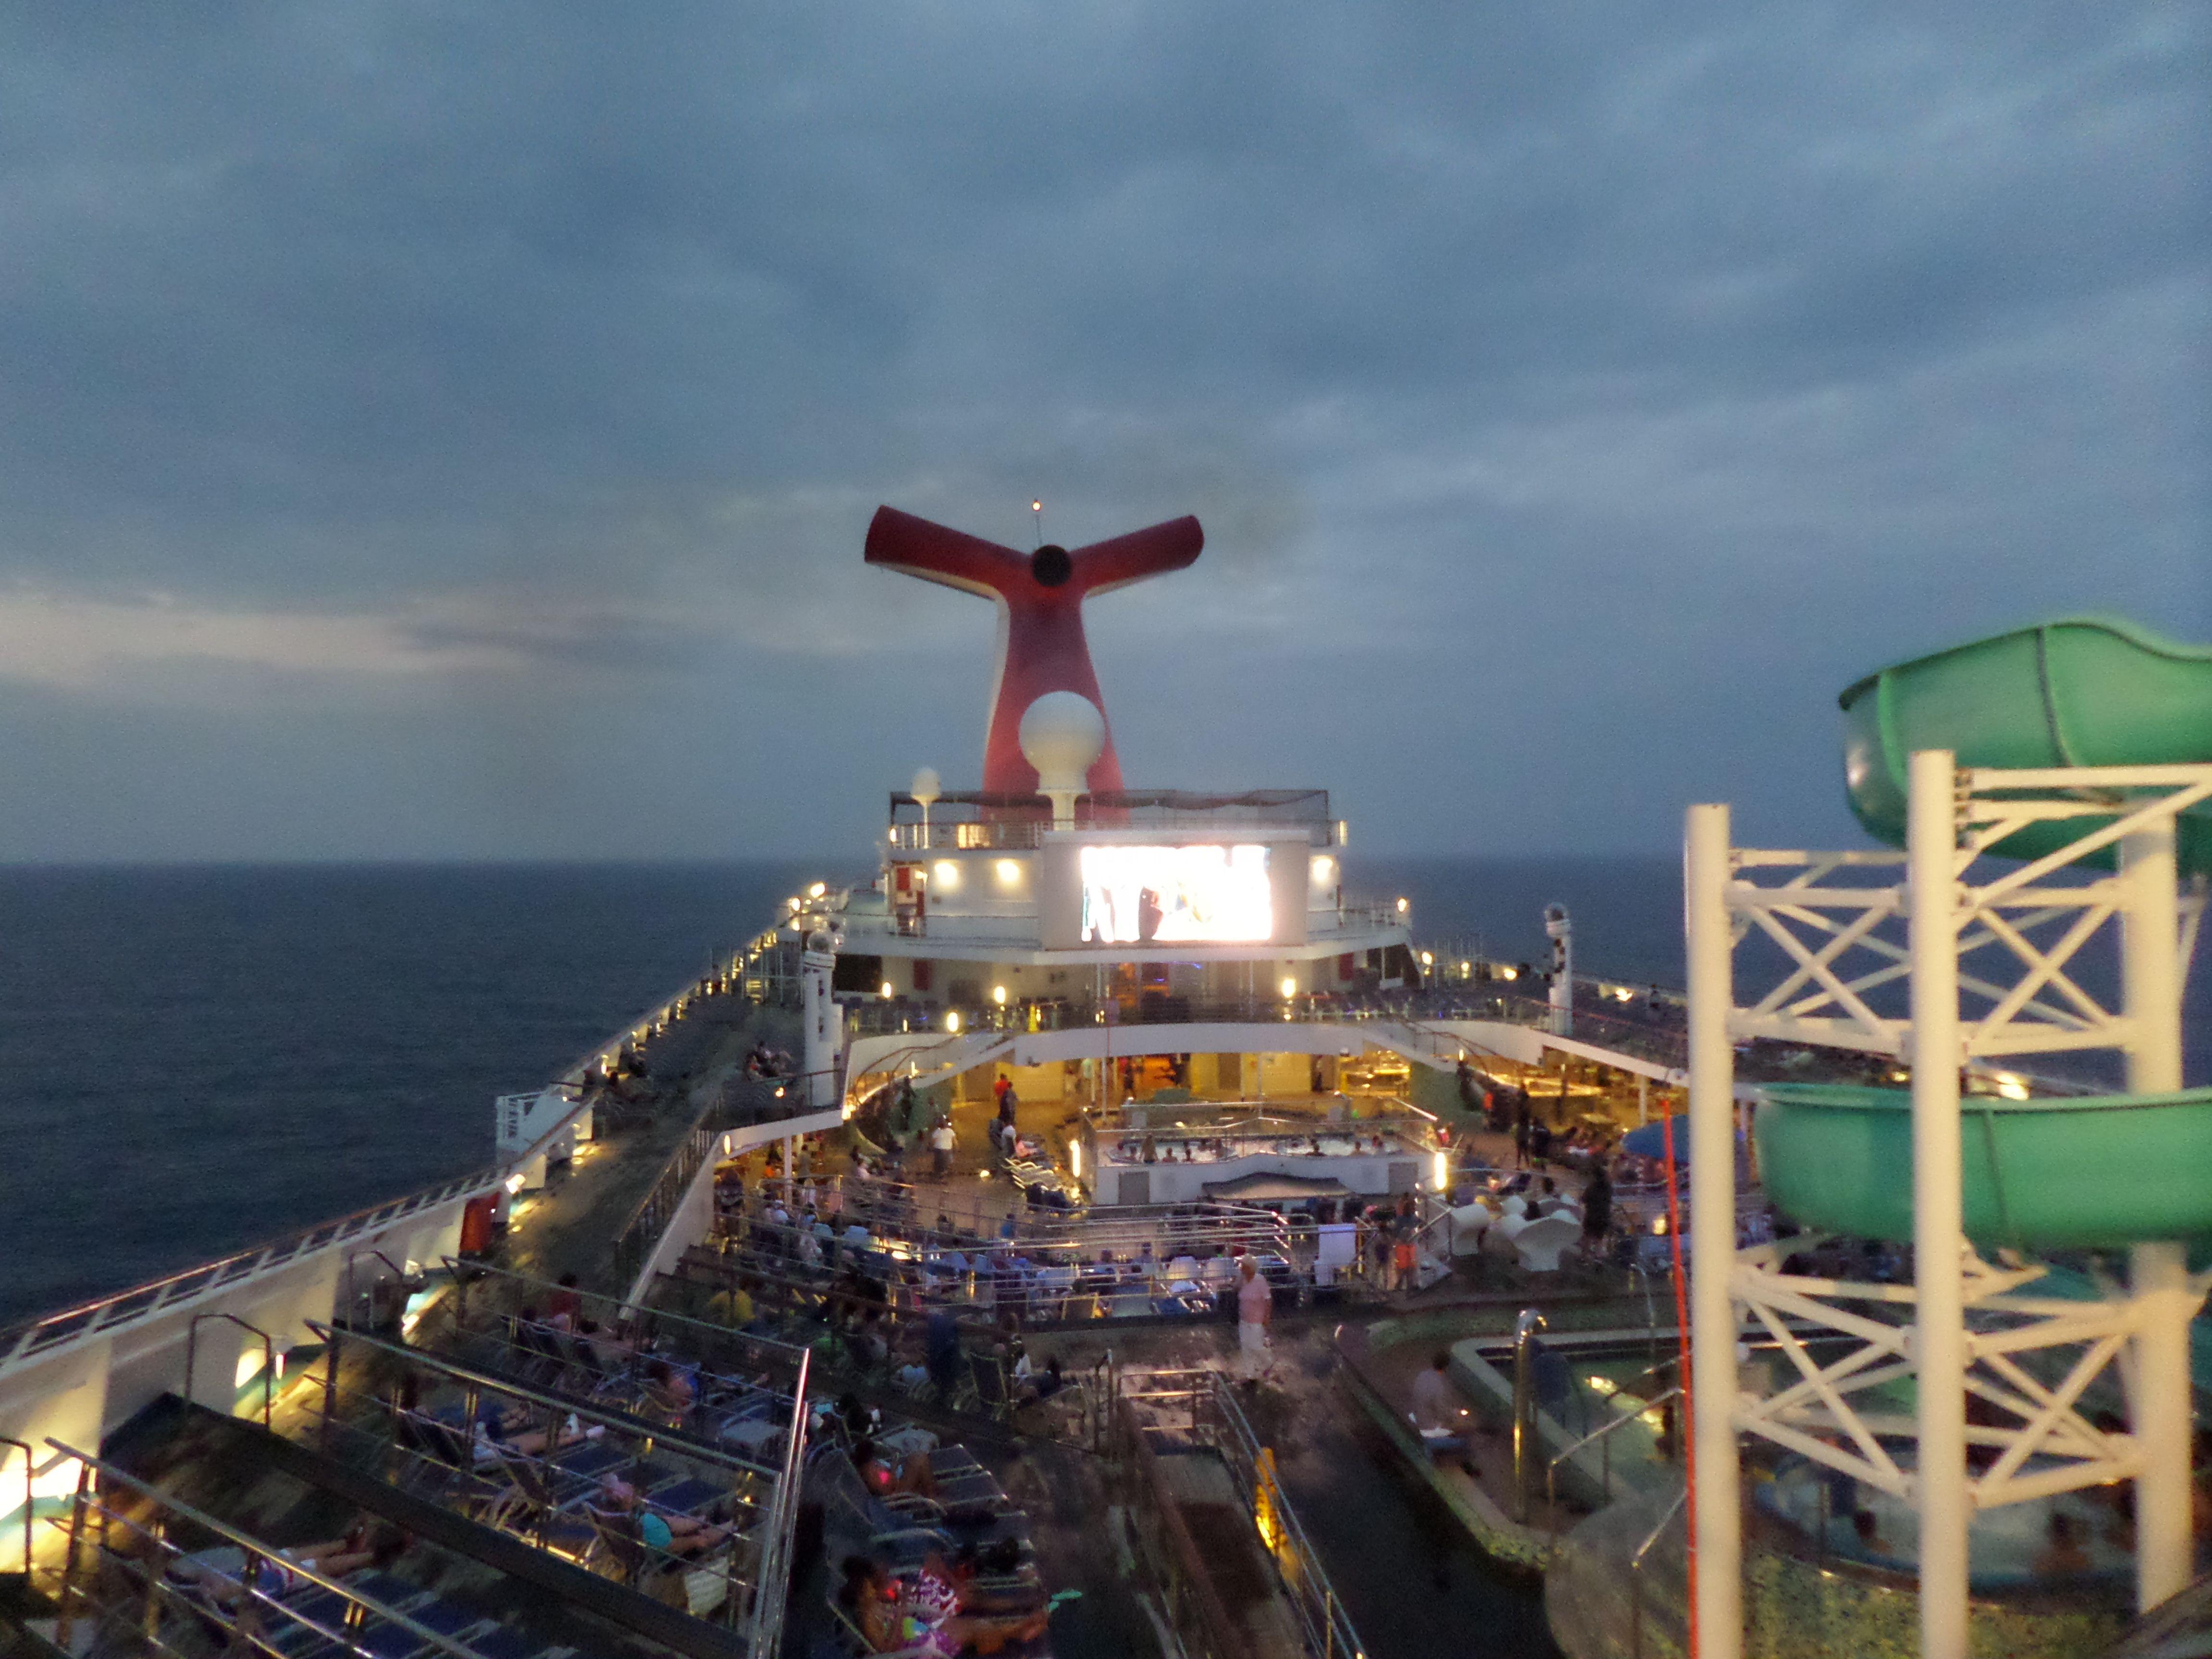 Carnival Valor. I love this ship.